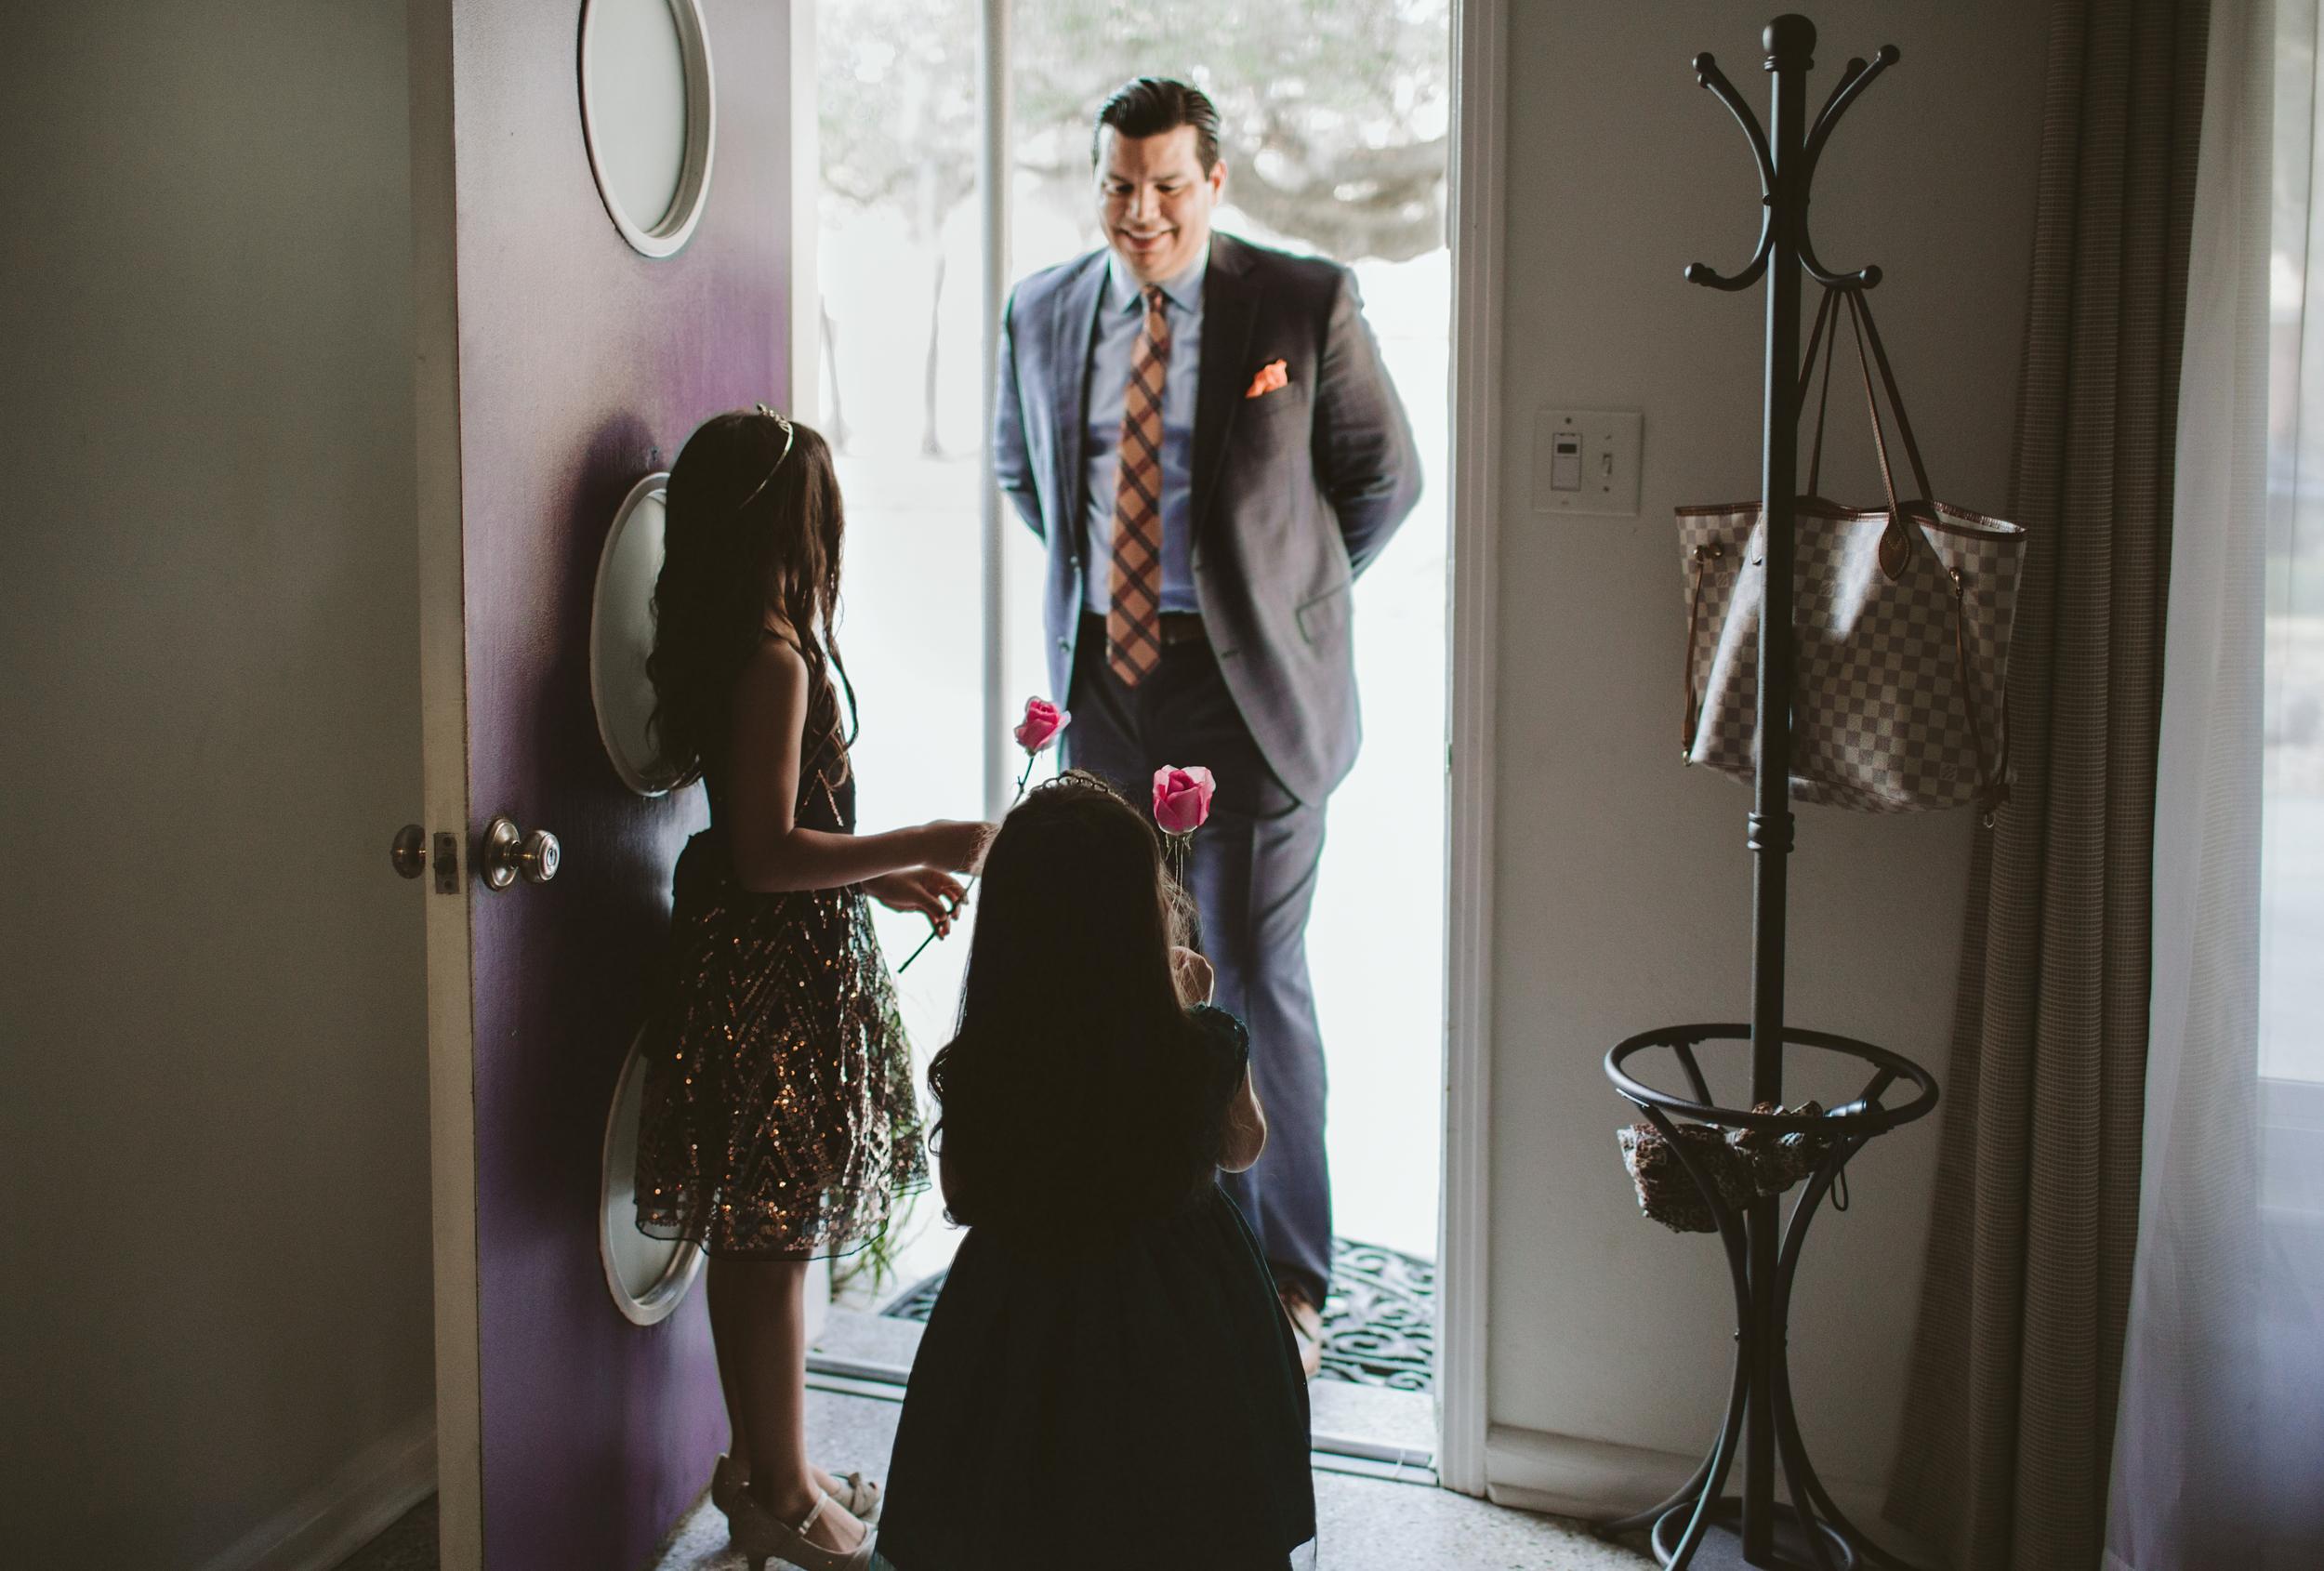 Daddy daughter dance | Vanessa Boy |VANESSABOY.COM-140.com final set .jpg